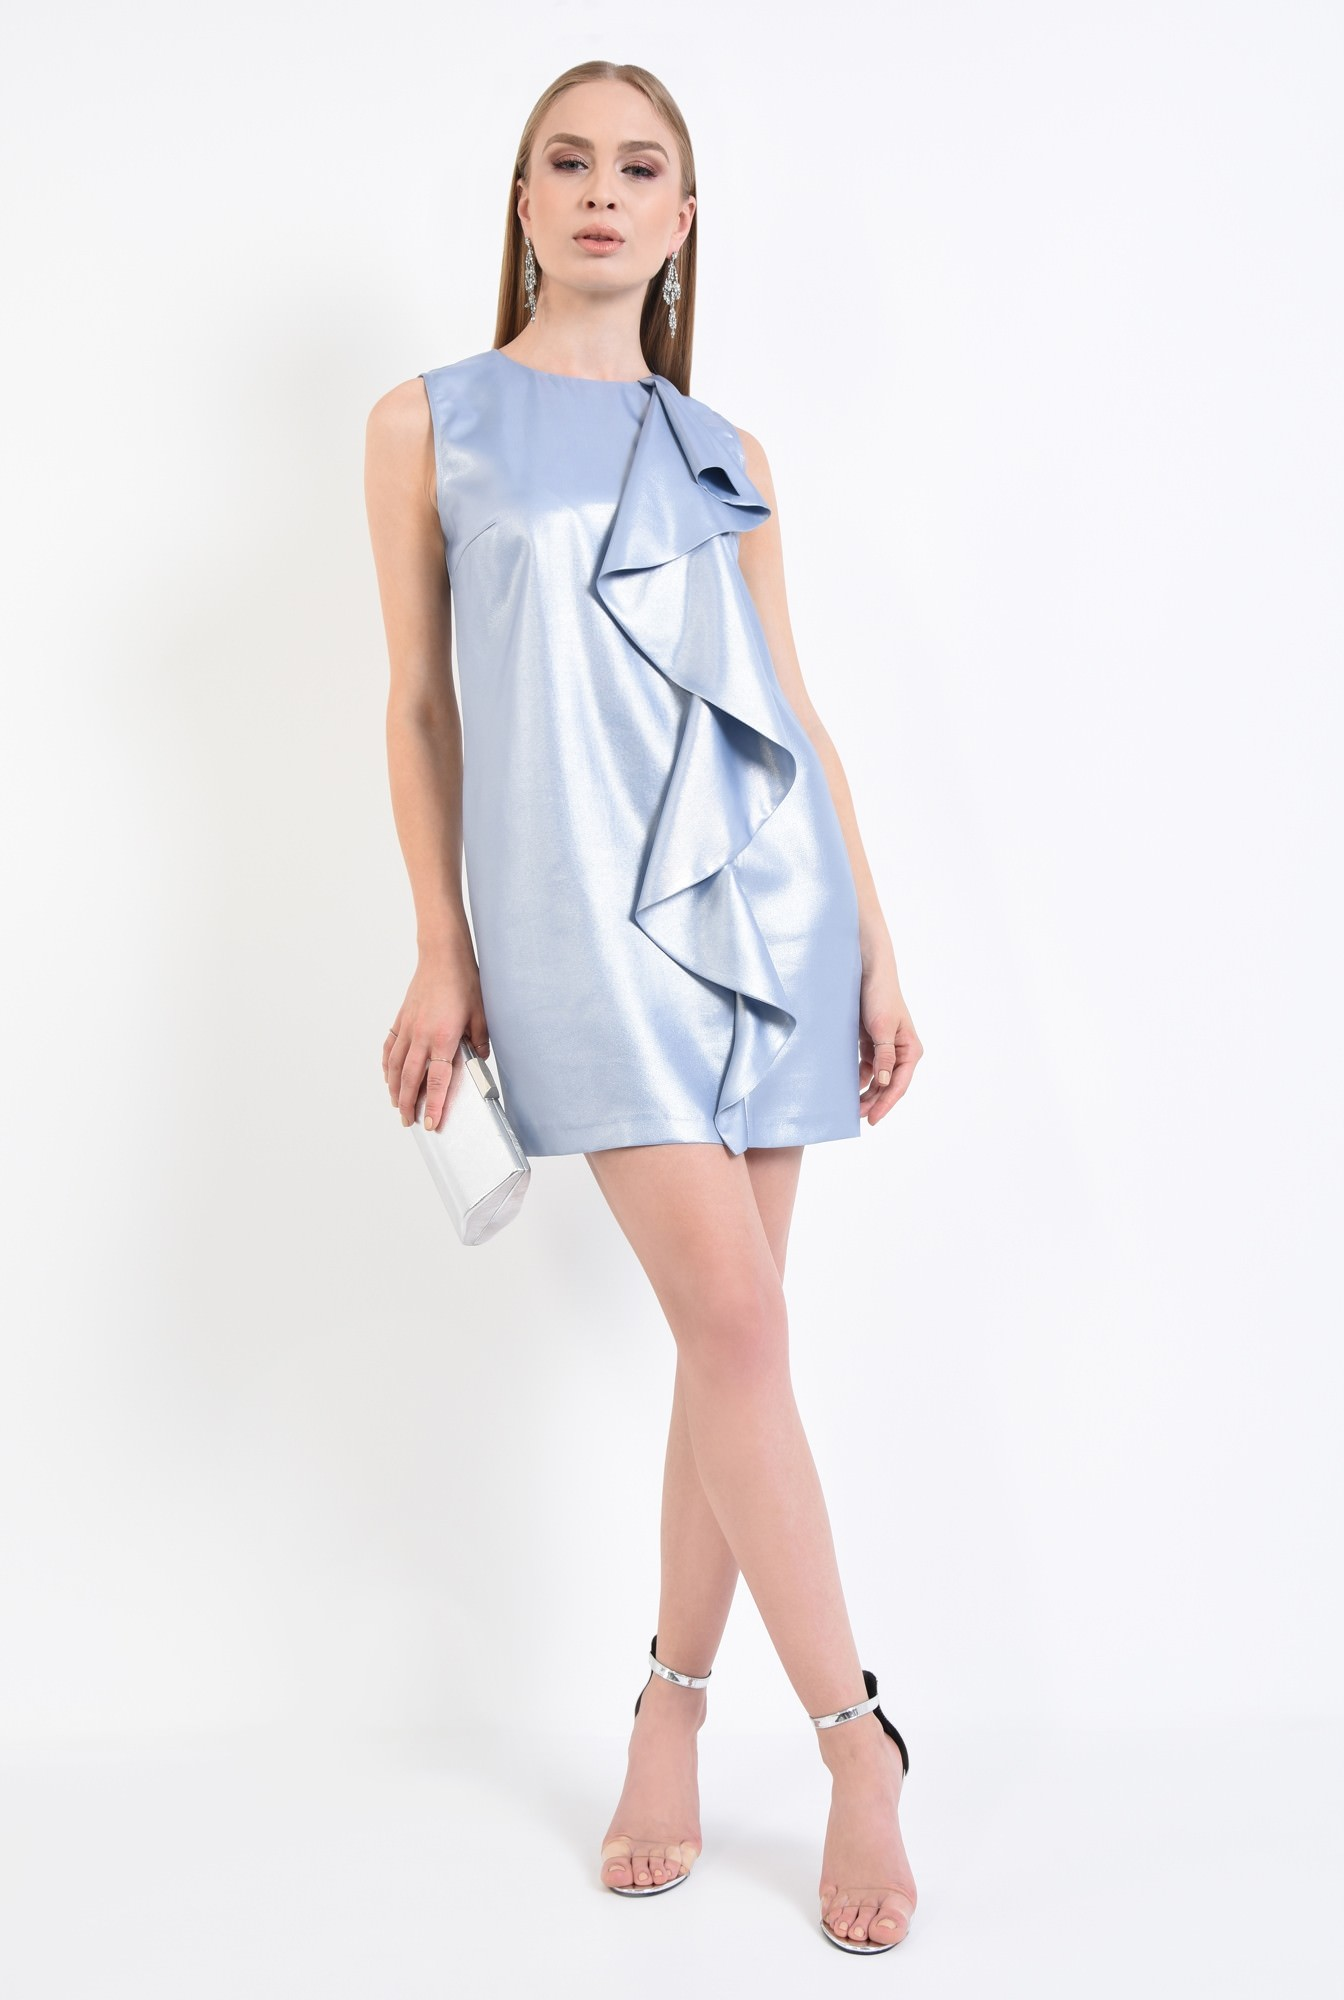 3 - rochie de ocazie, bleu, argintiu, scurta